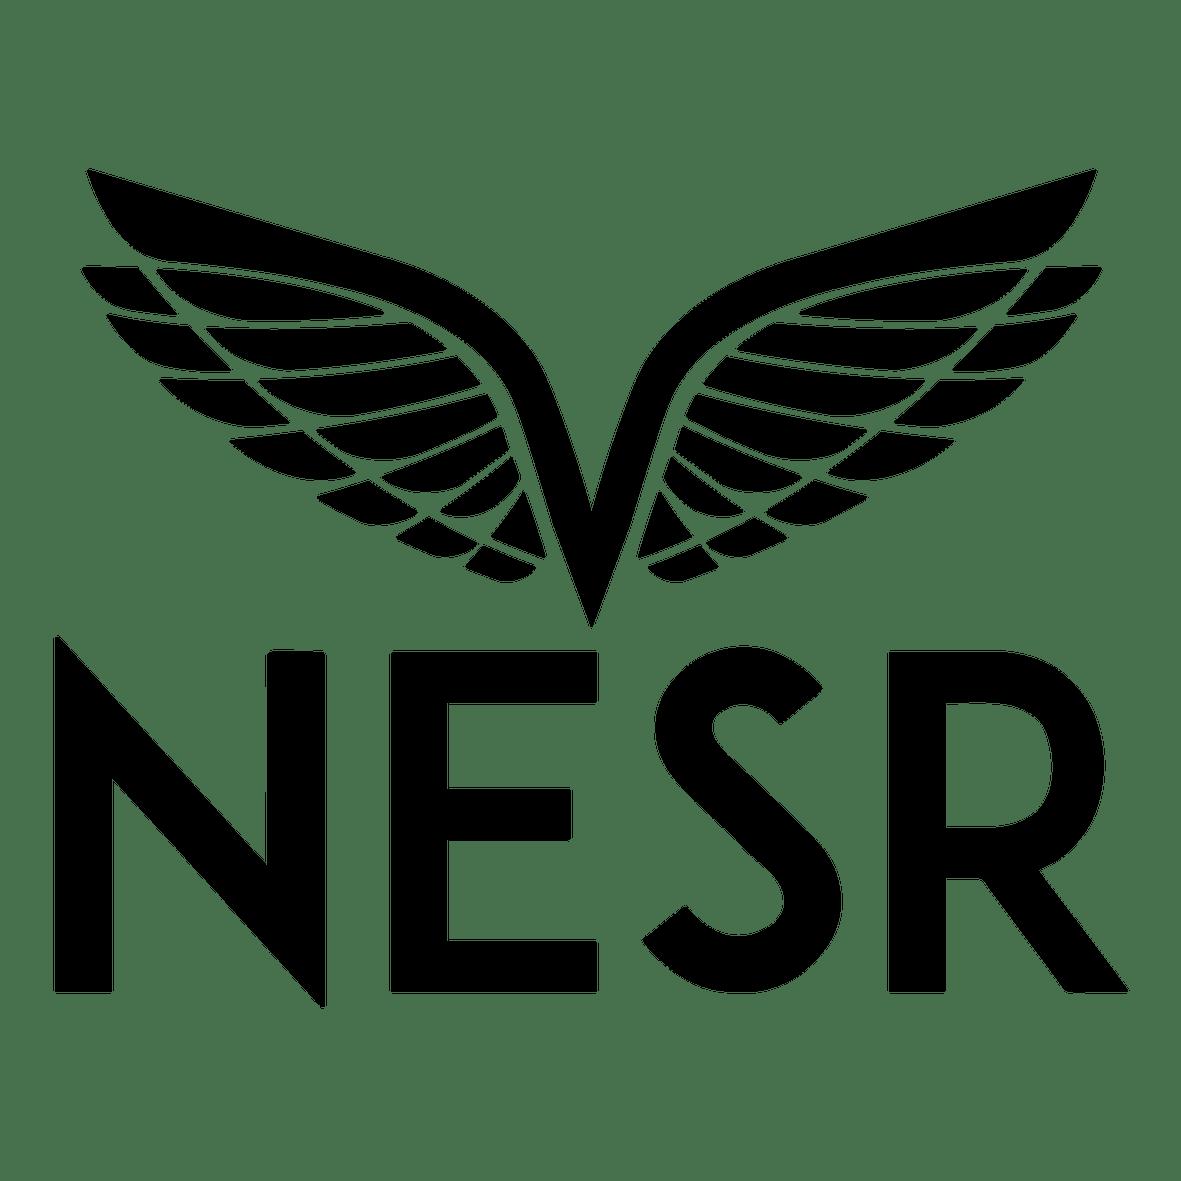 NATIONAL ENERGY SERVICES REUNITED CORP.  (NESR)